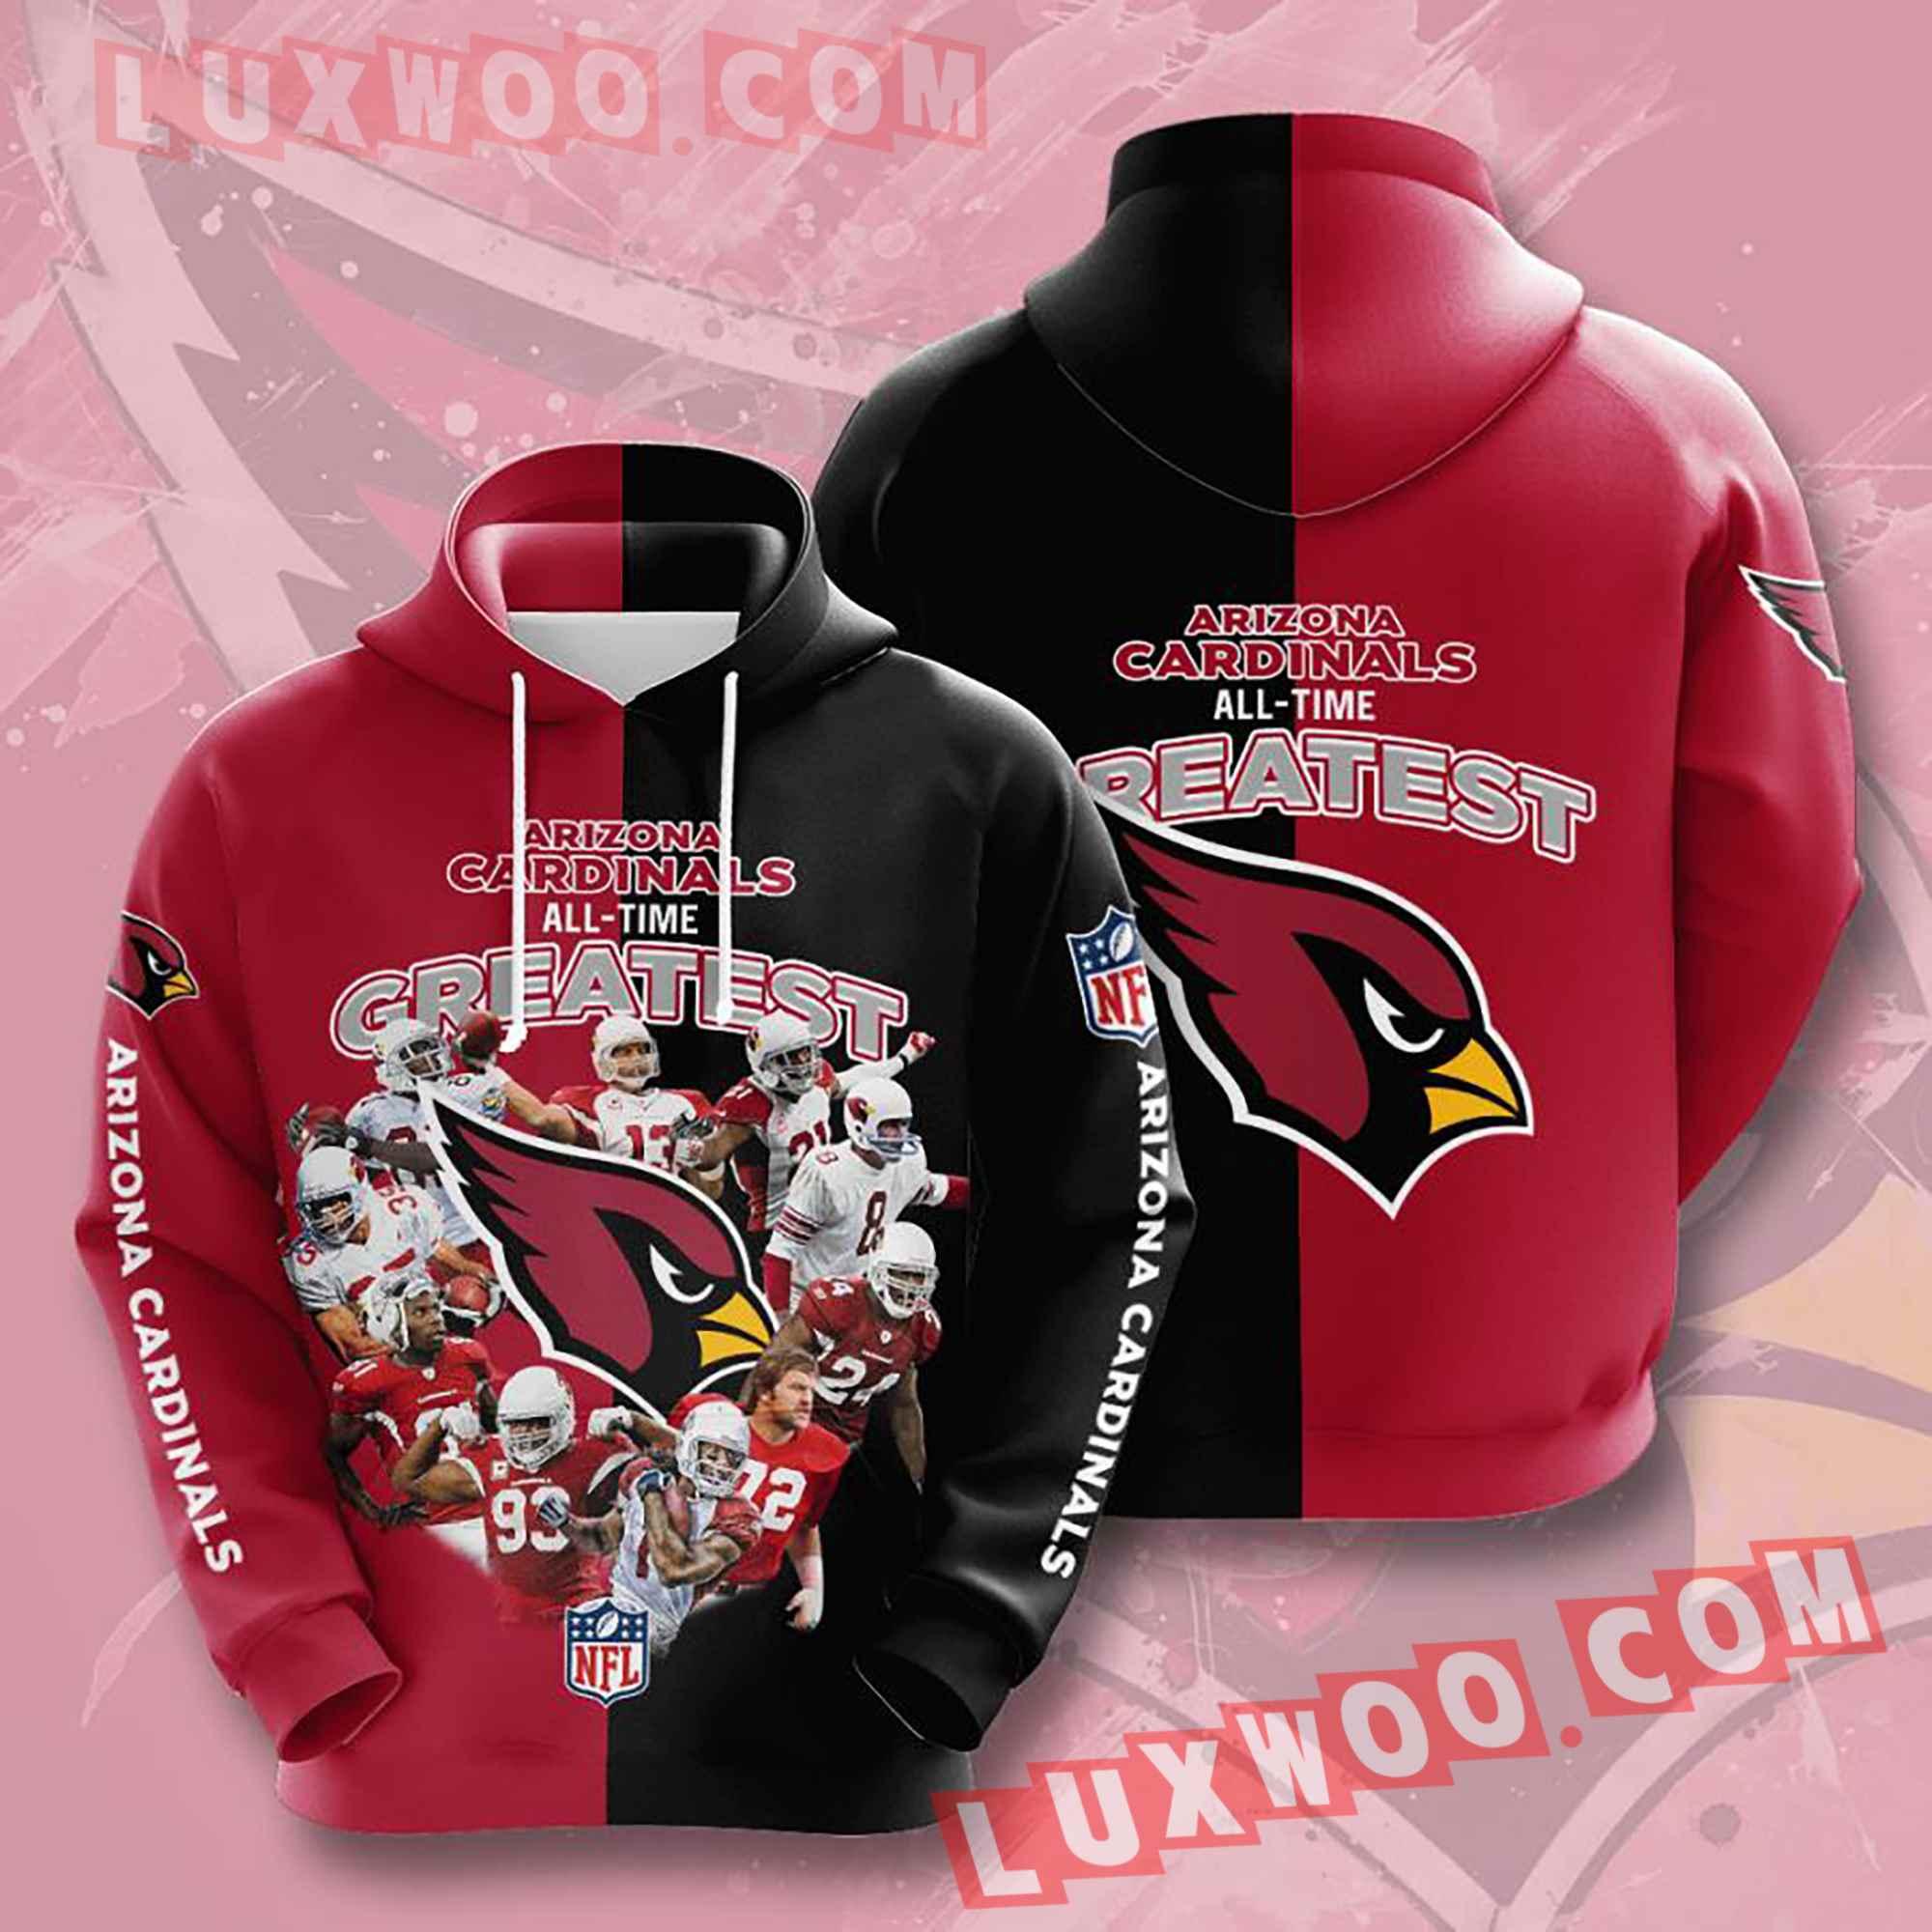 Nfl Arizona Cardinals Hoodies Custom All Over Print 3d Pullover Hoodie V2